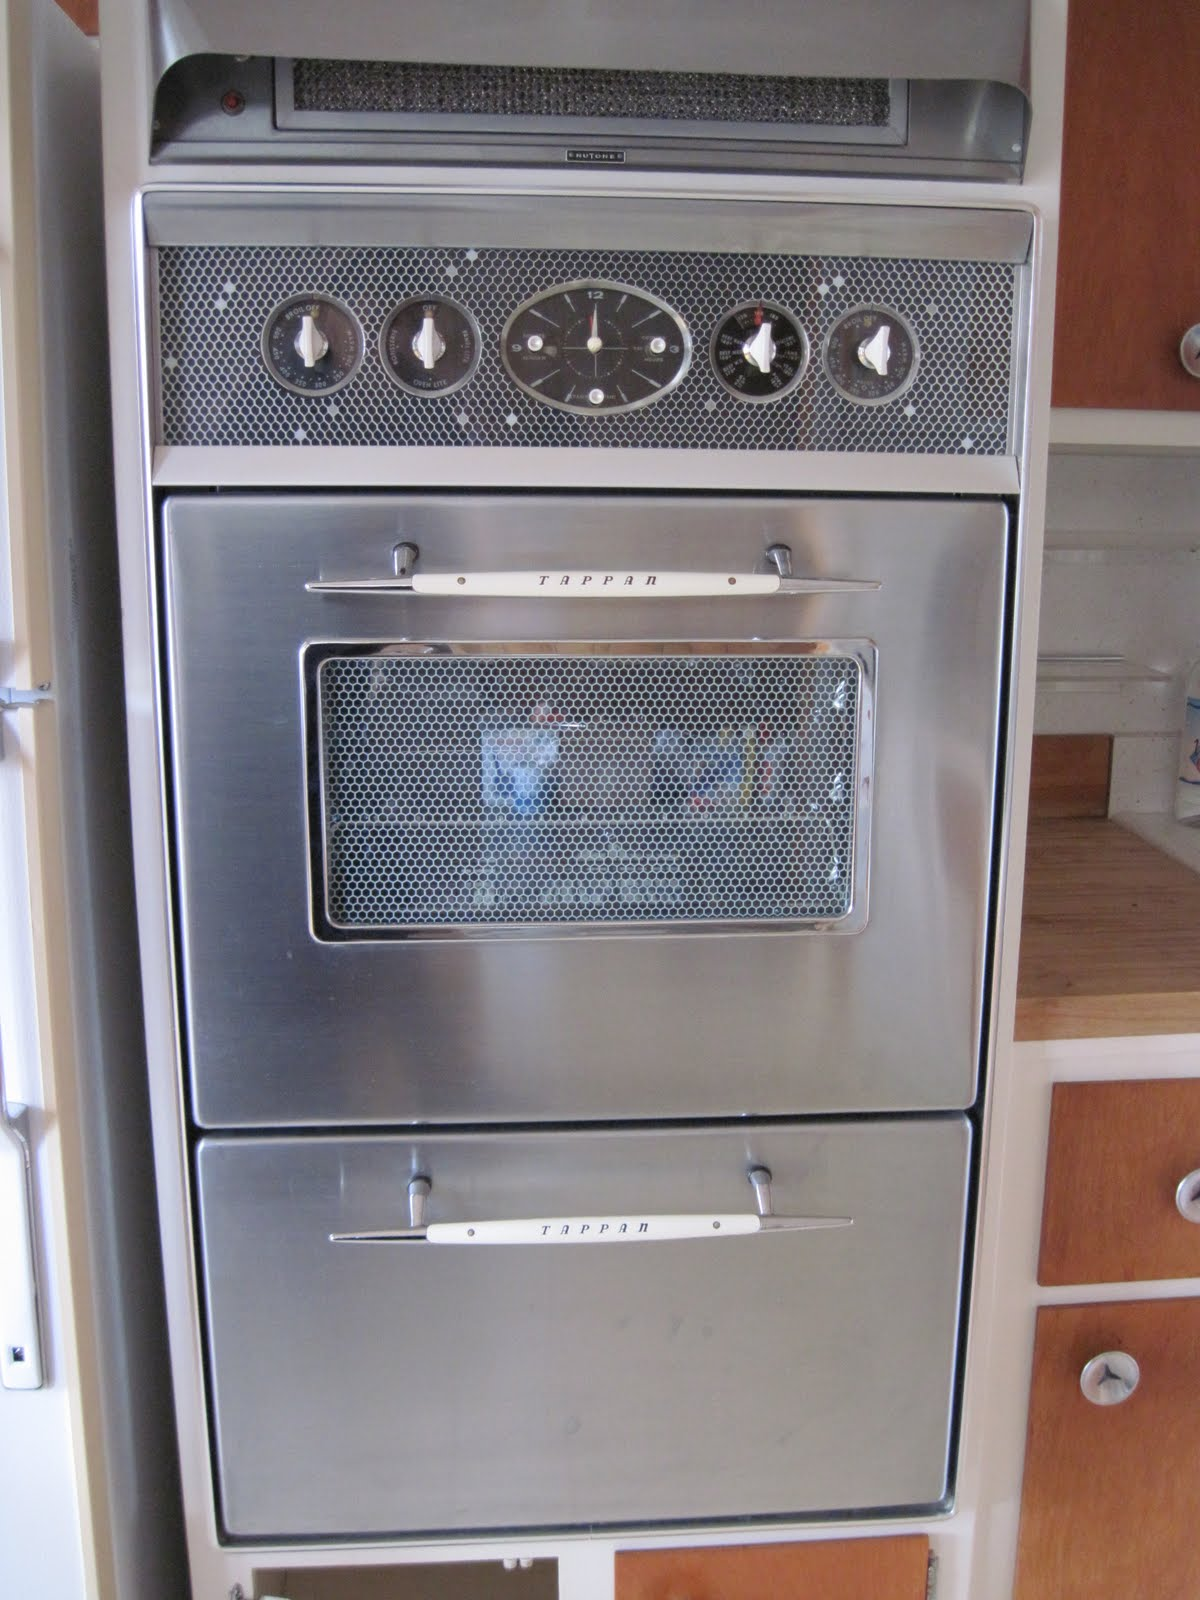 Tappan Wall Oven Manual Bing images